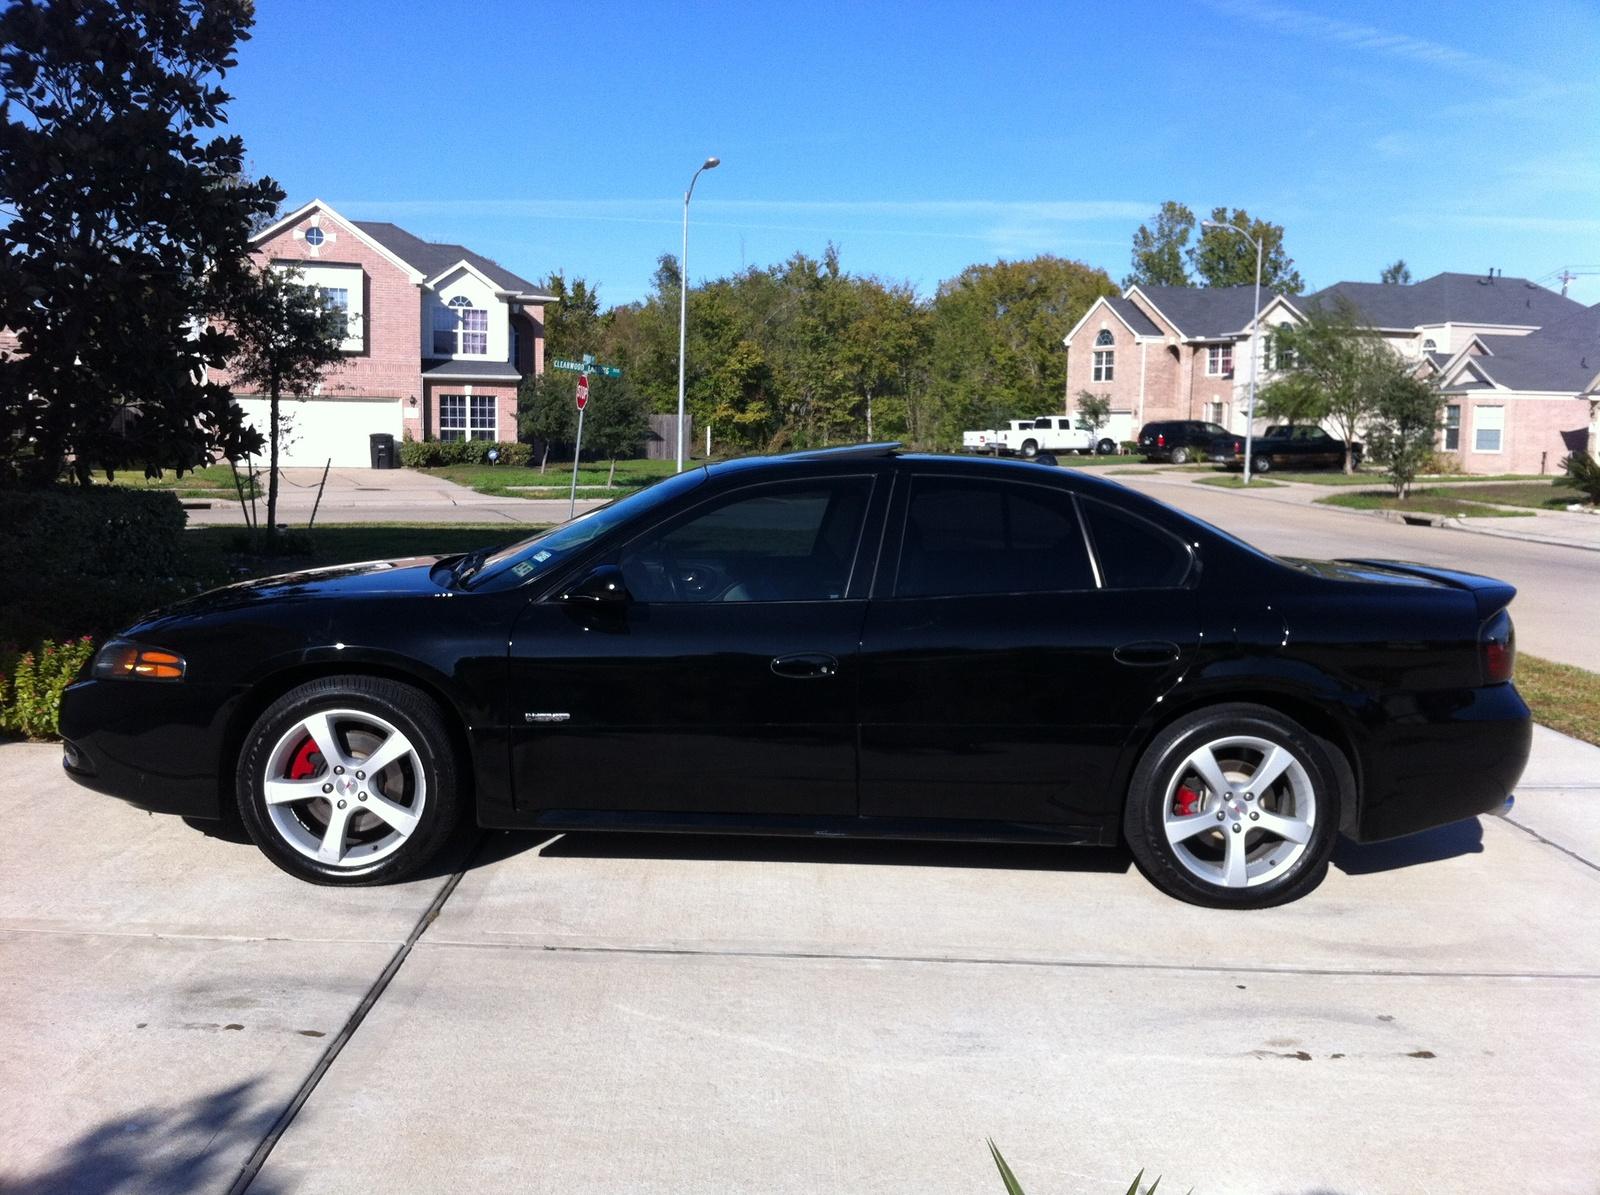 Pontiac pontiac gxp specs : 2003 Pontiac Bonneville GXP related infomation,specifications ...